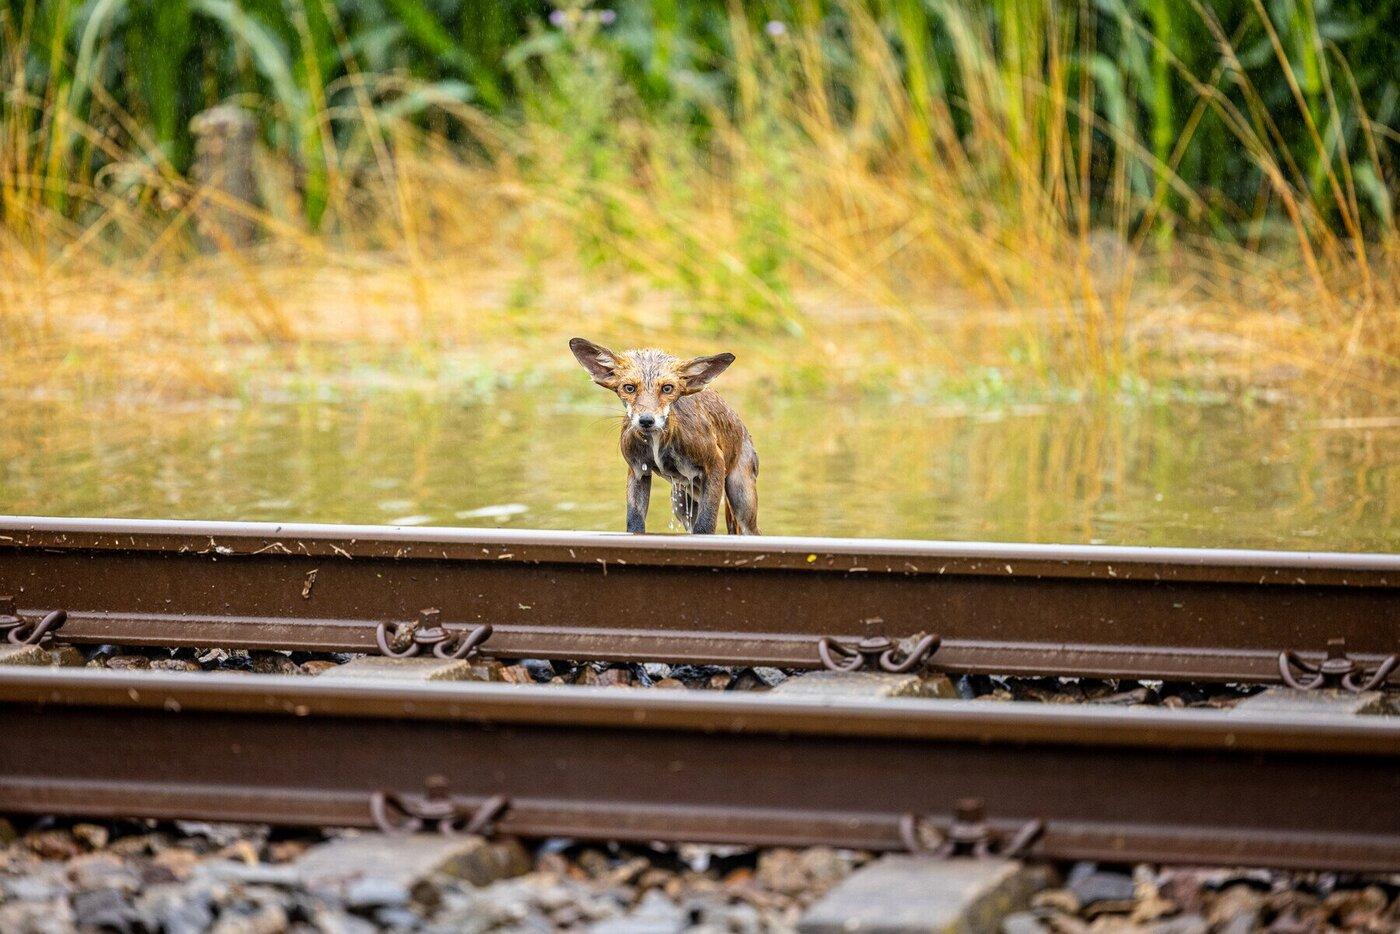 Vos wateroverlast spoor Stefan Verkerk